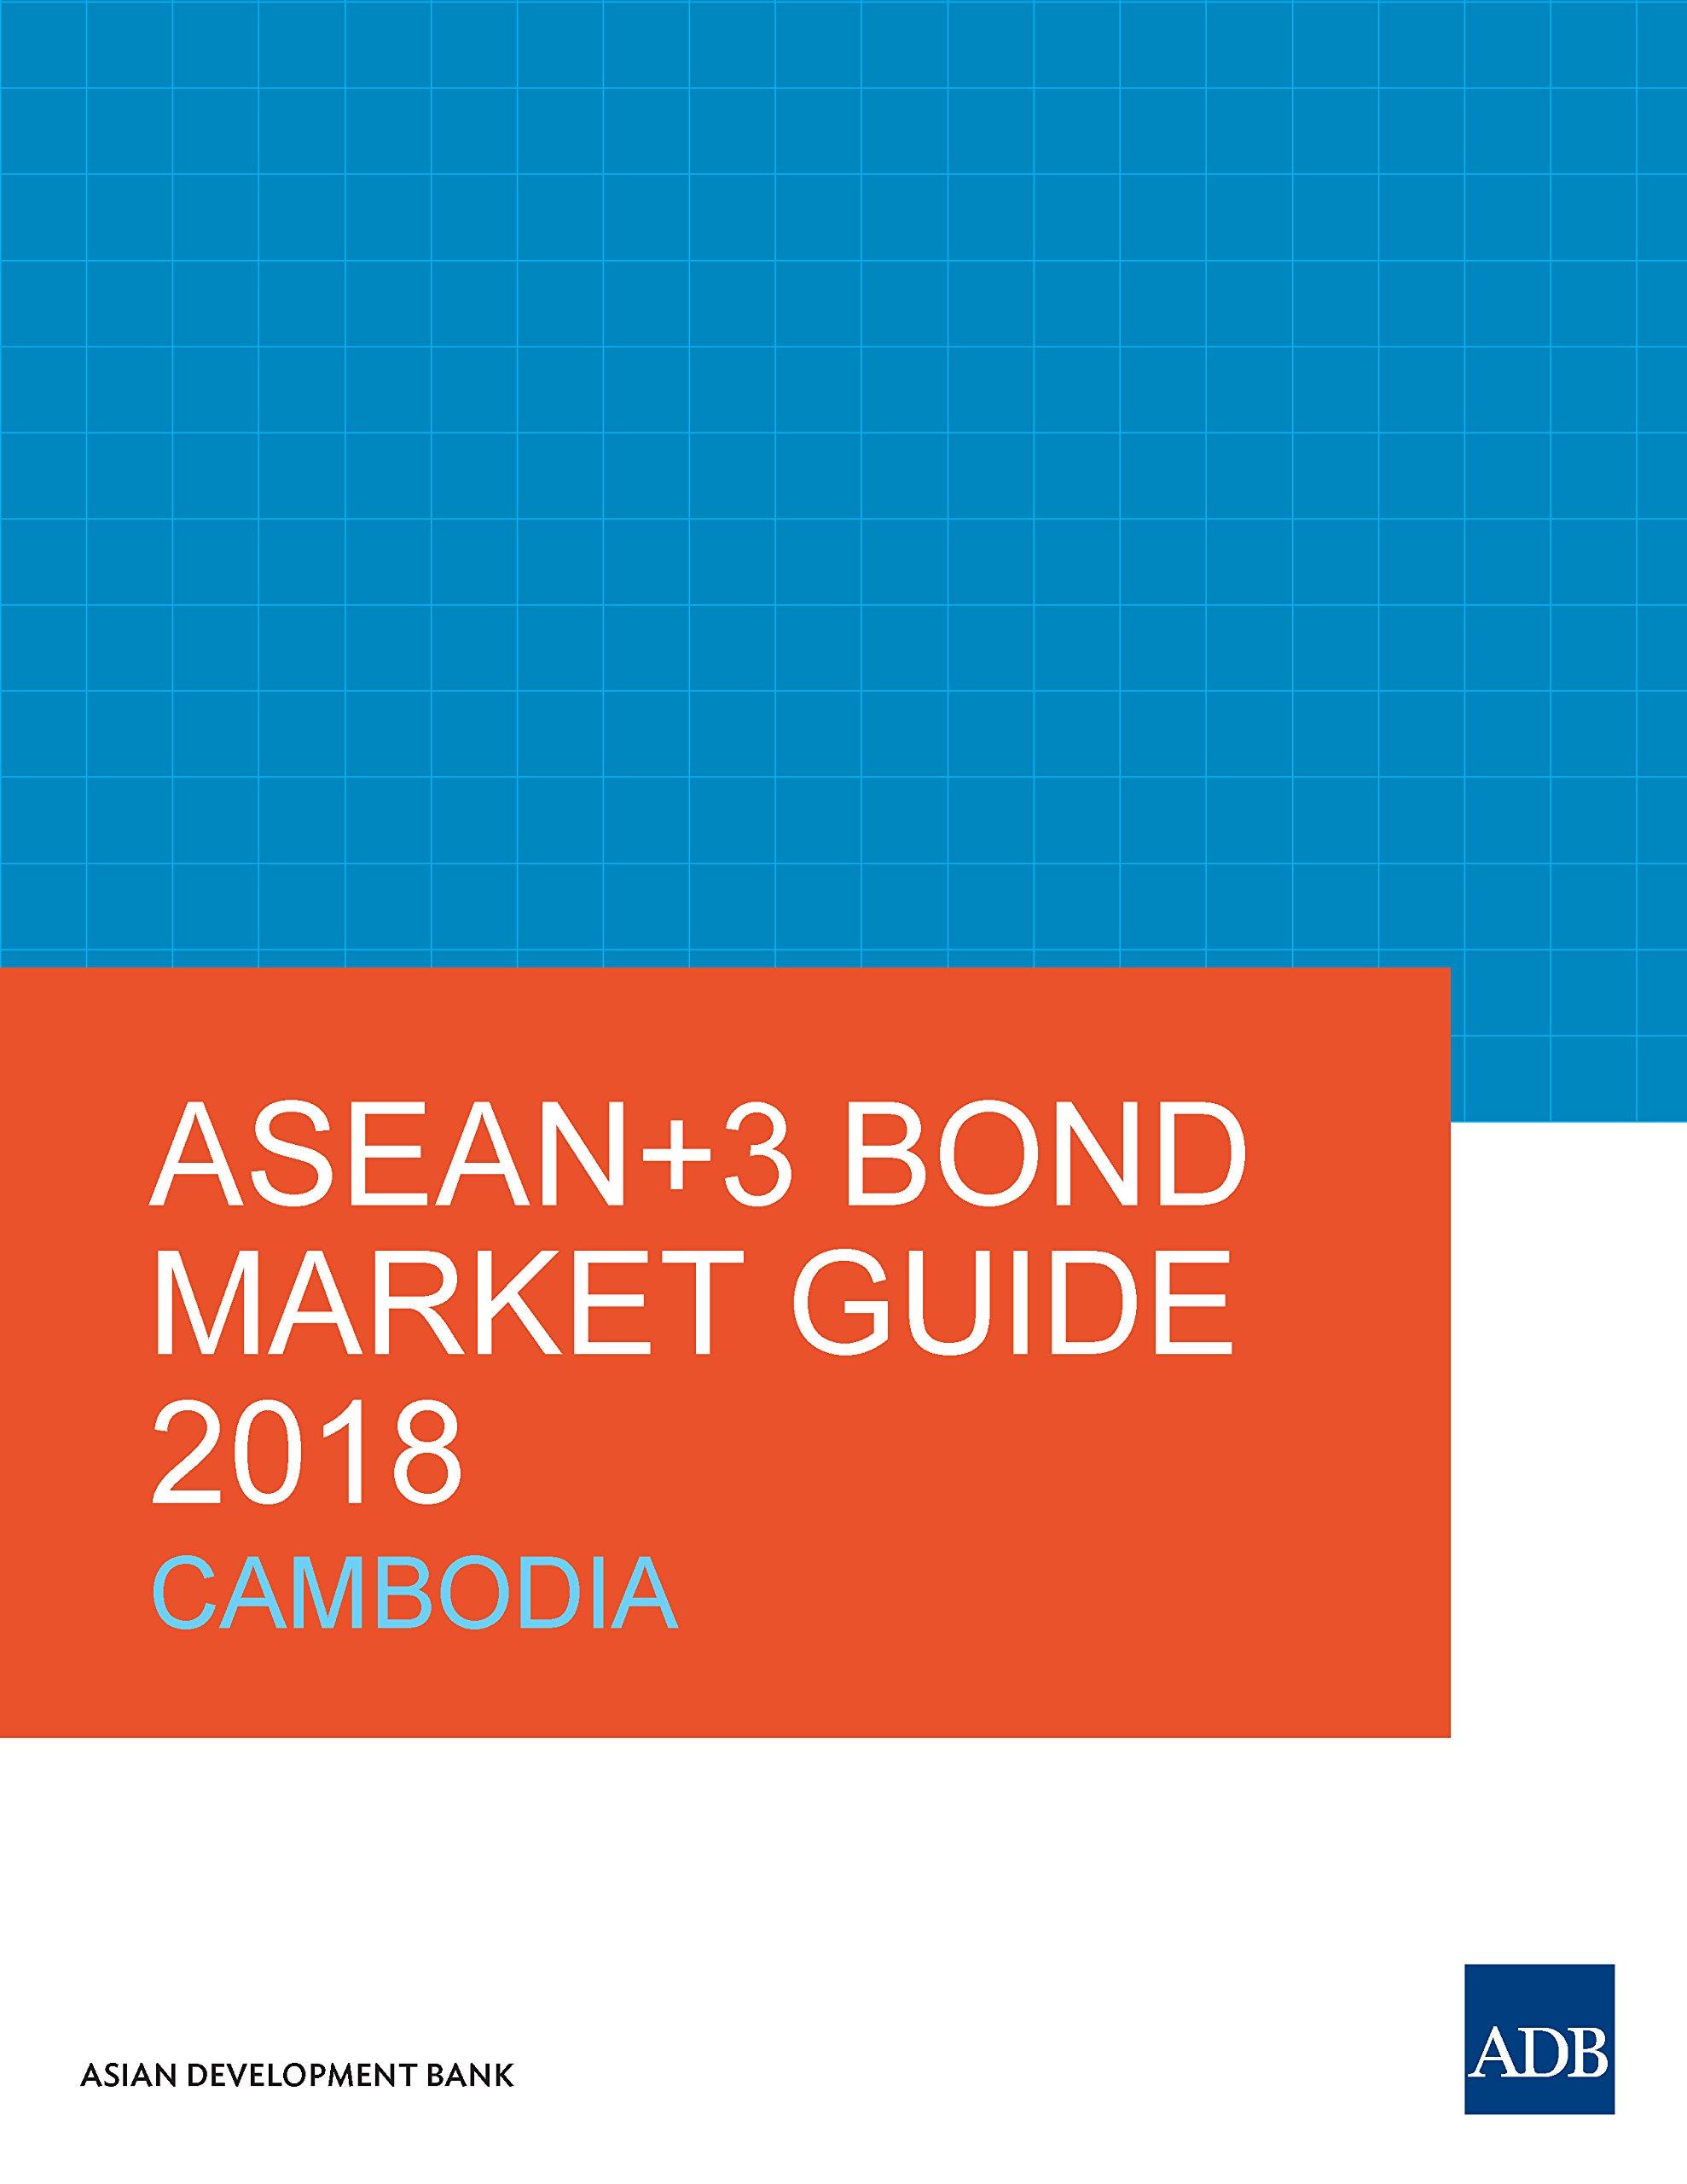 ASEAN+3 Bond Market Guide 2018 Cambodia (ASEAN+3 Bond Market Guides)